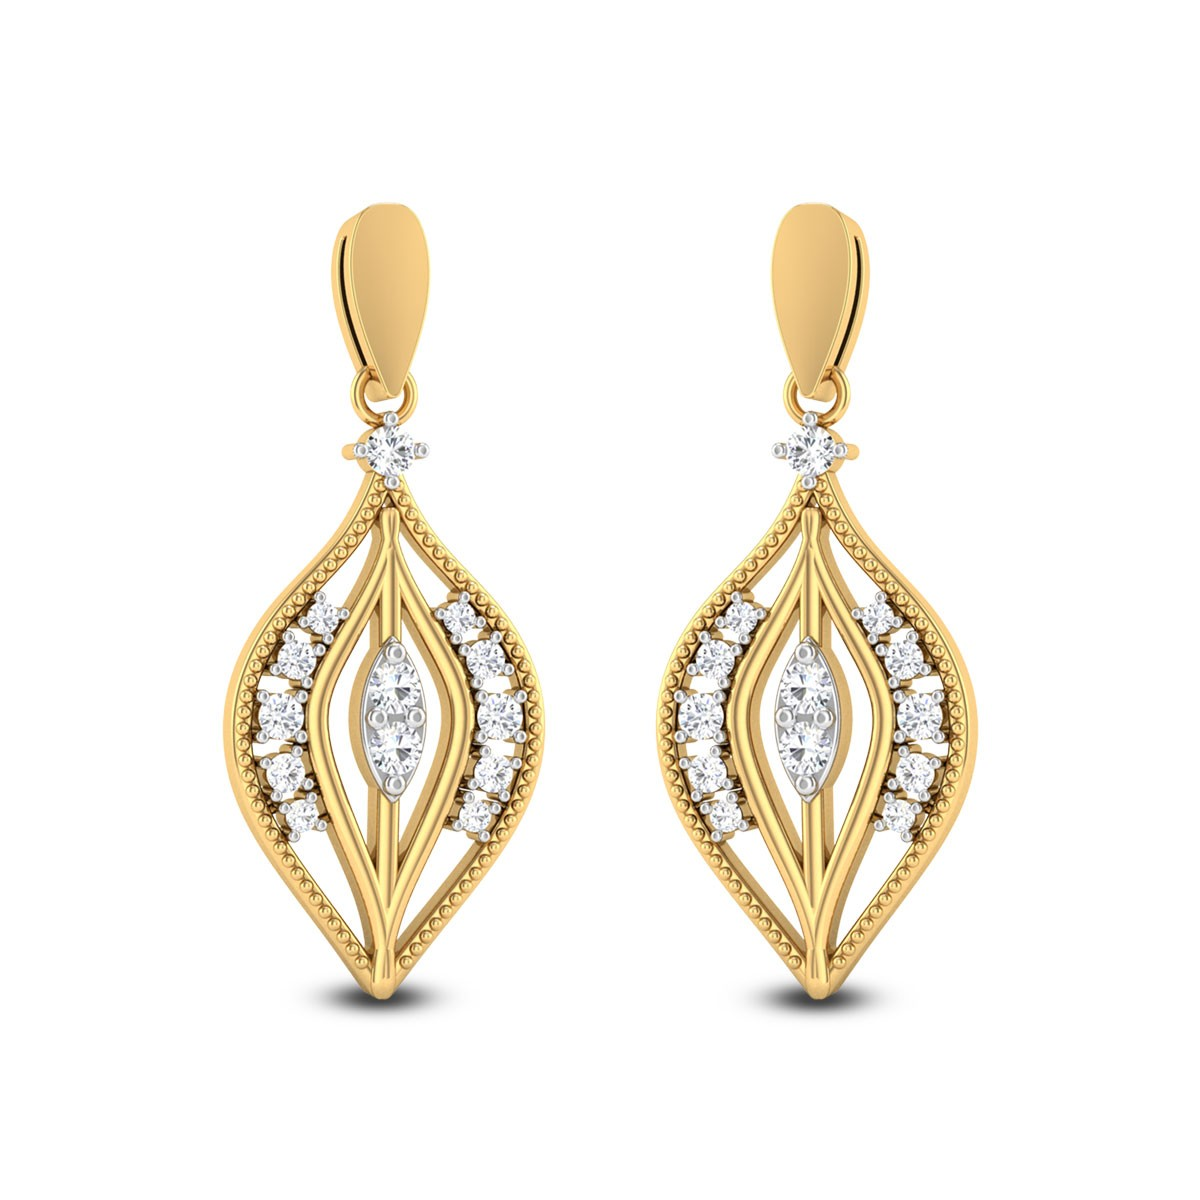 Avinata Diamond Earrings